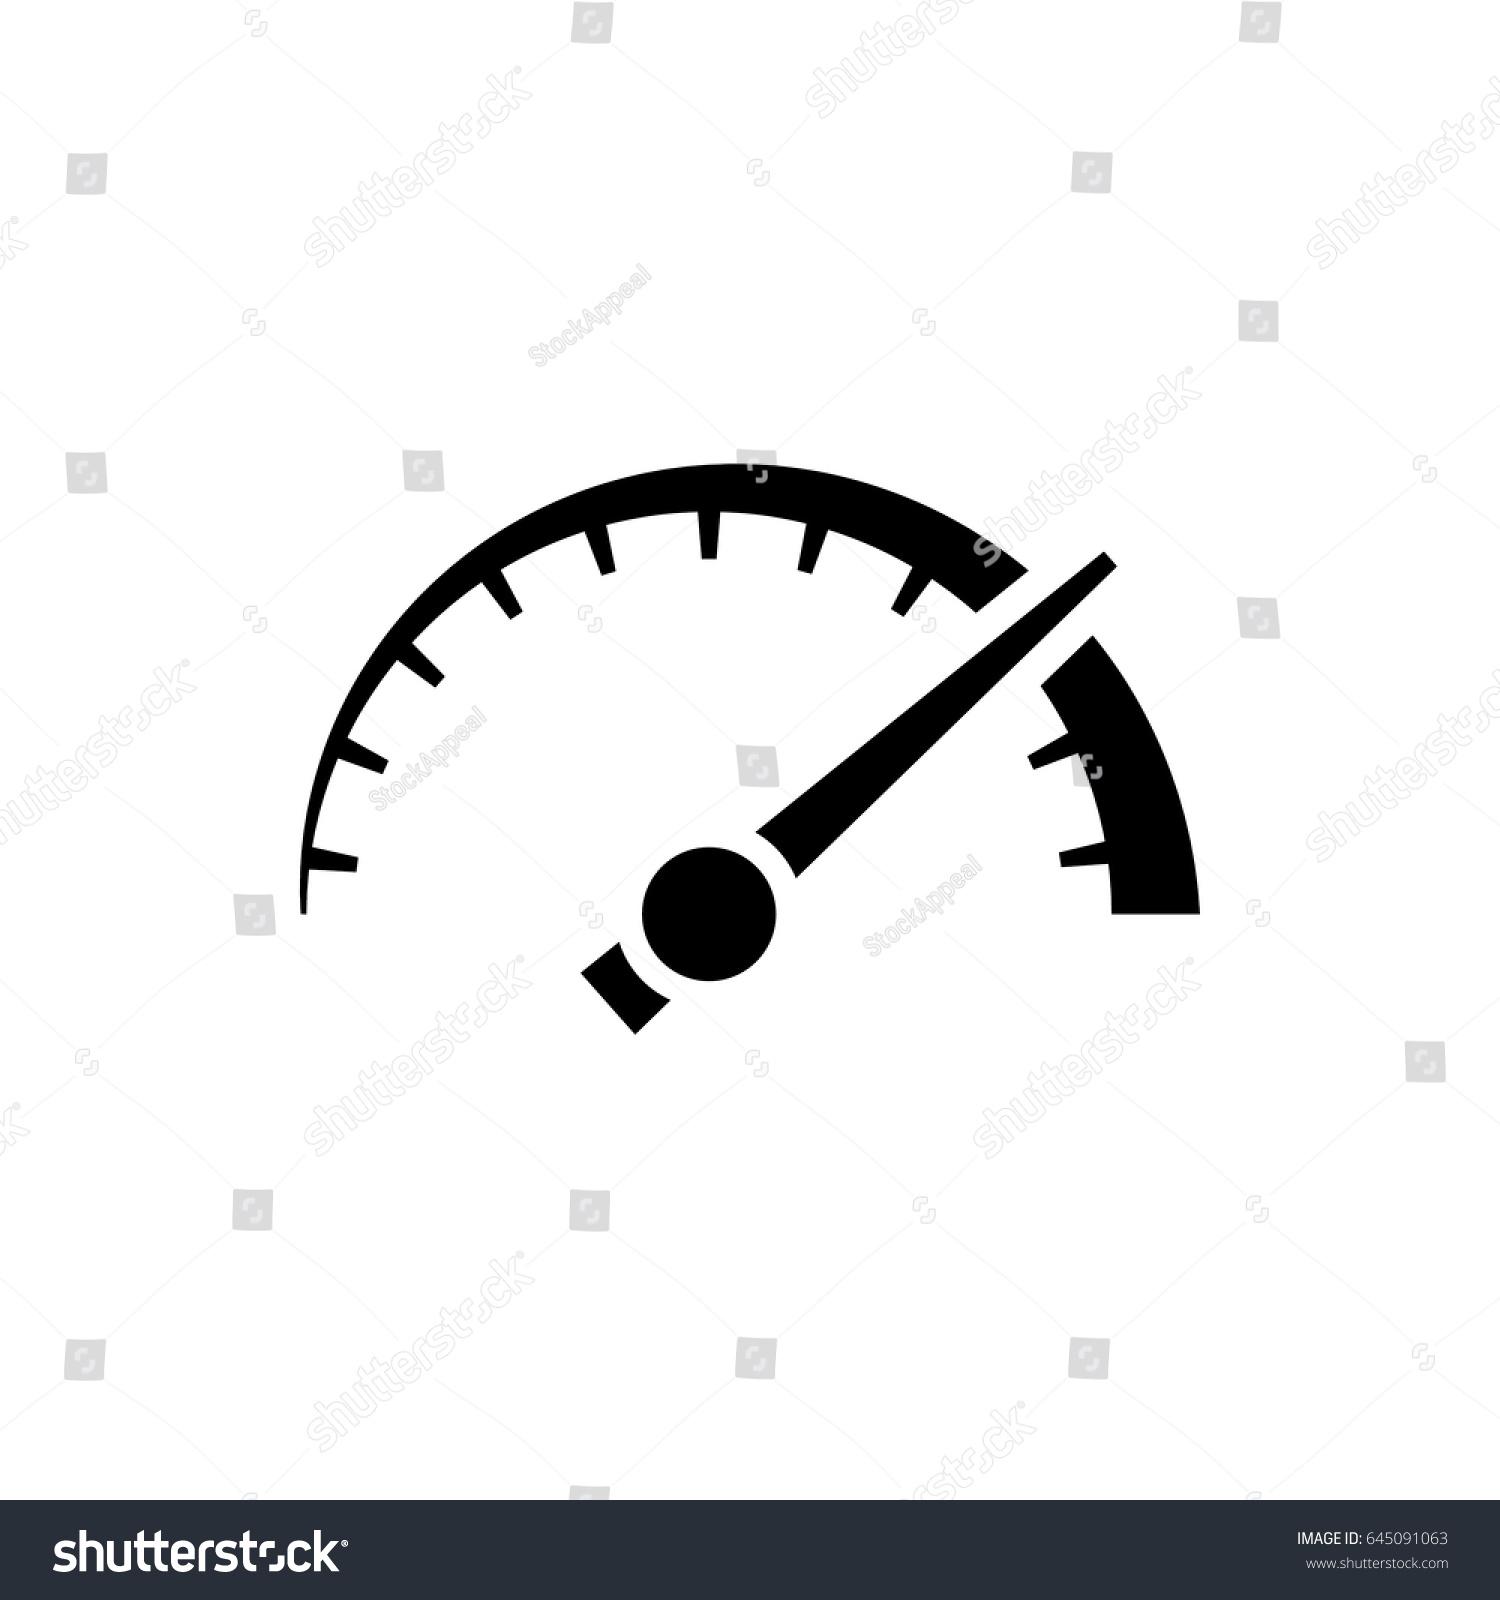 vector speedometer odometer icon thick black stock vector 2018 rh shutterstock com vector speedometer manual speedometer vector icon